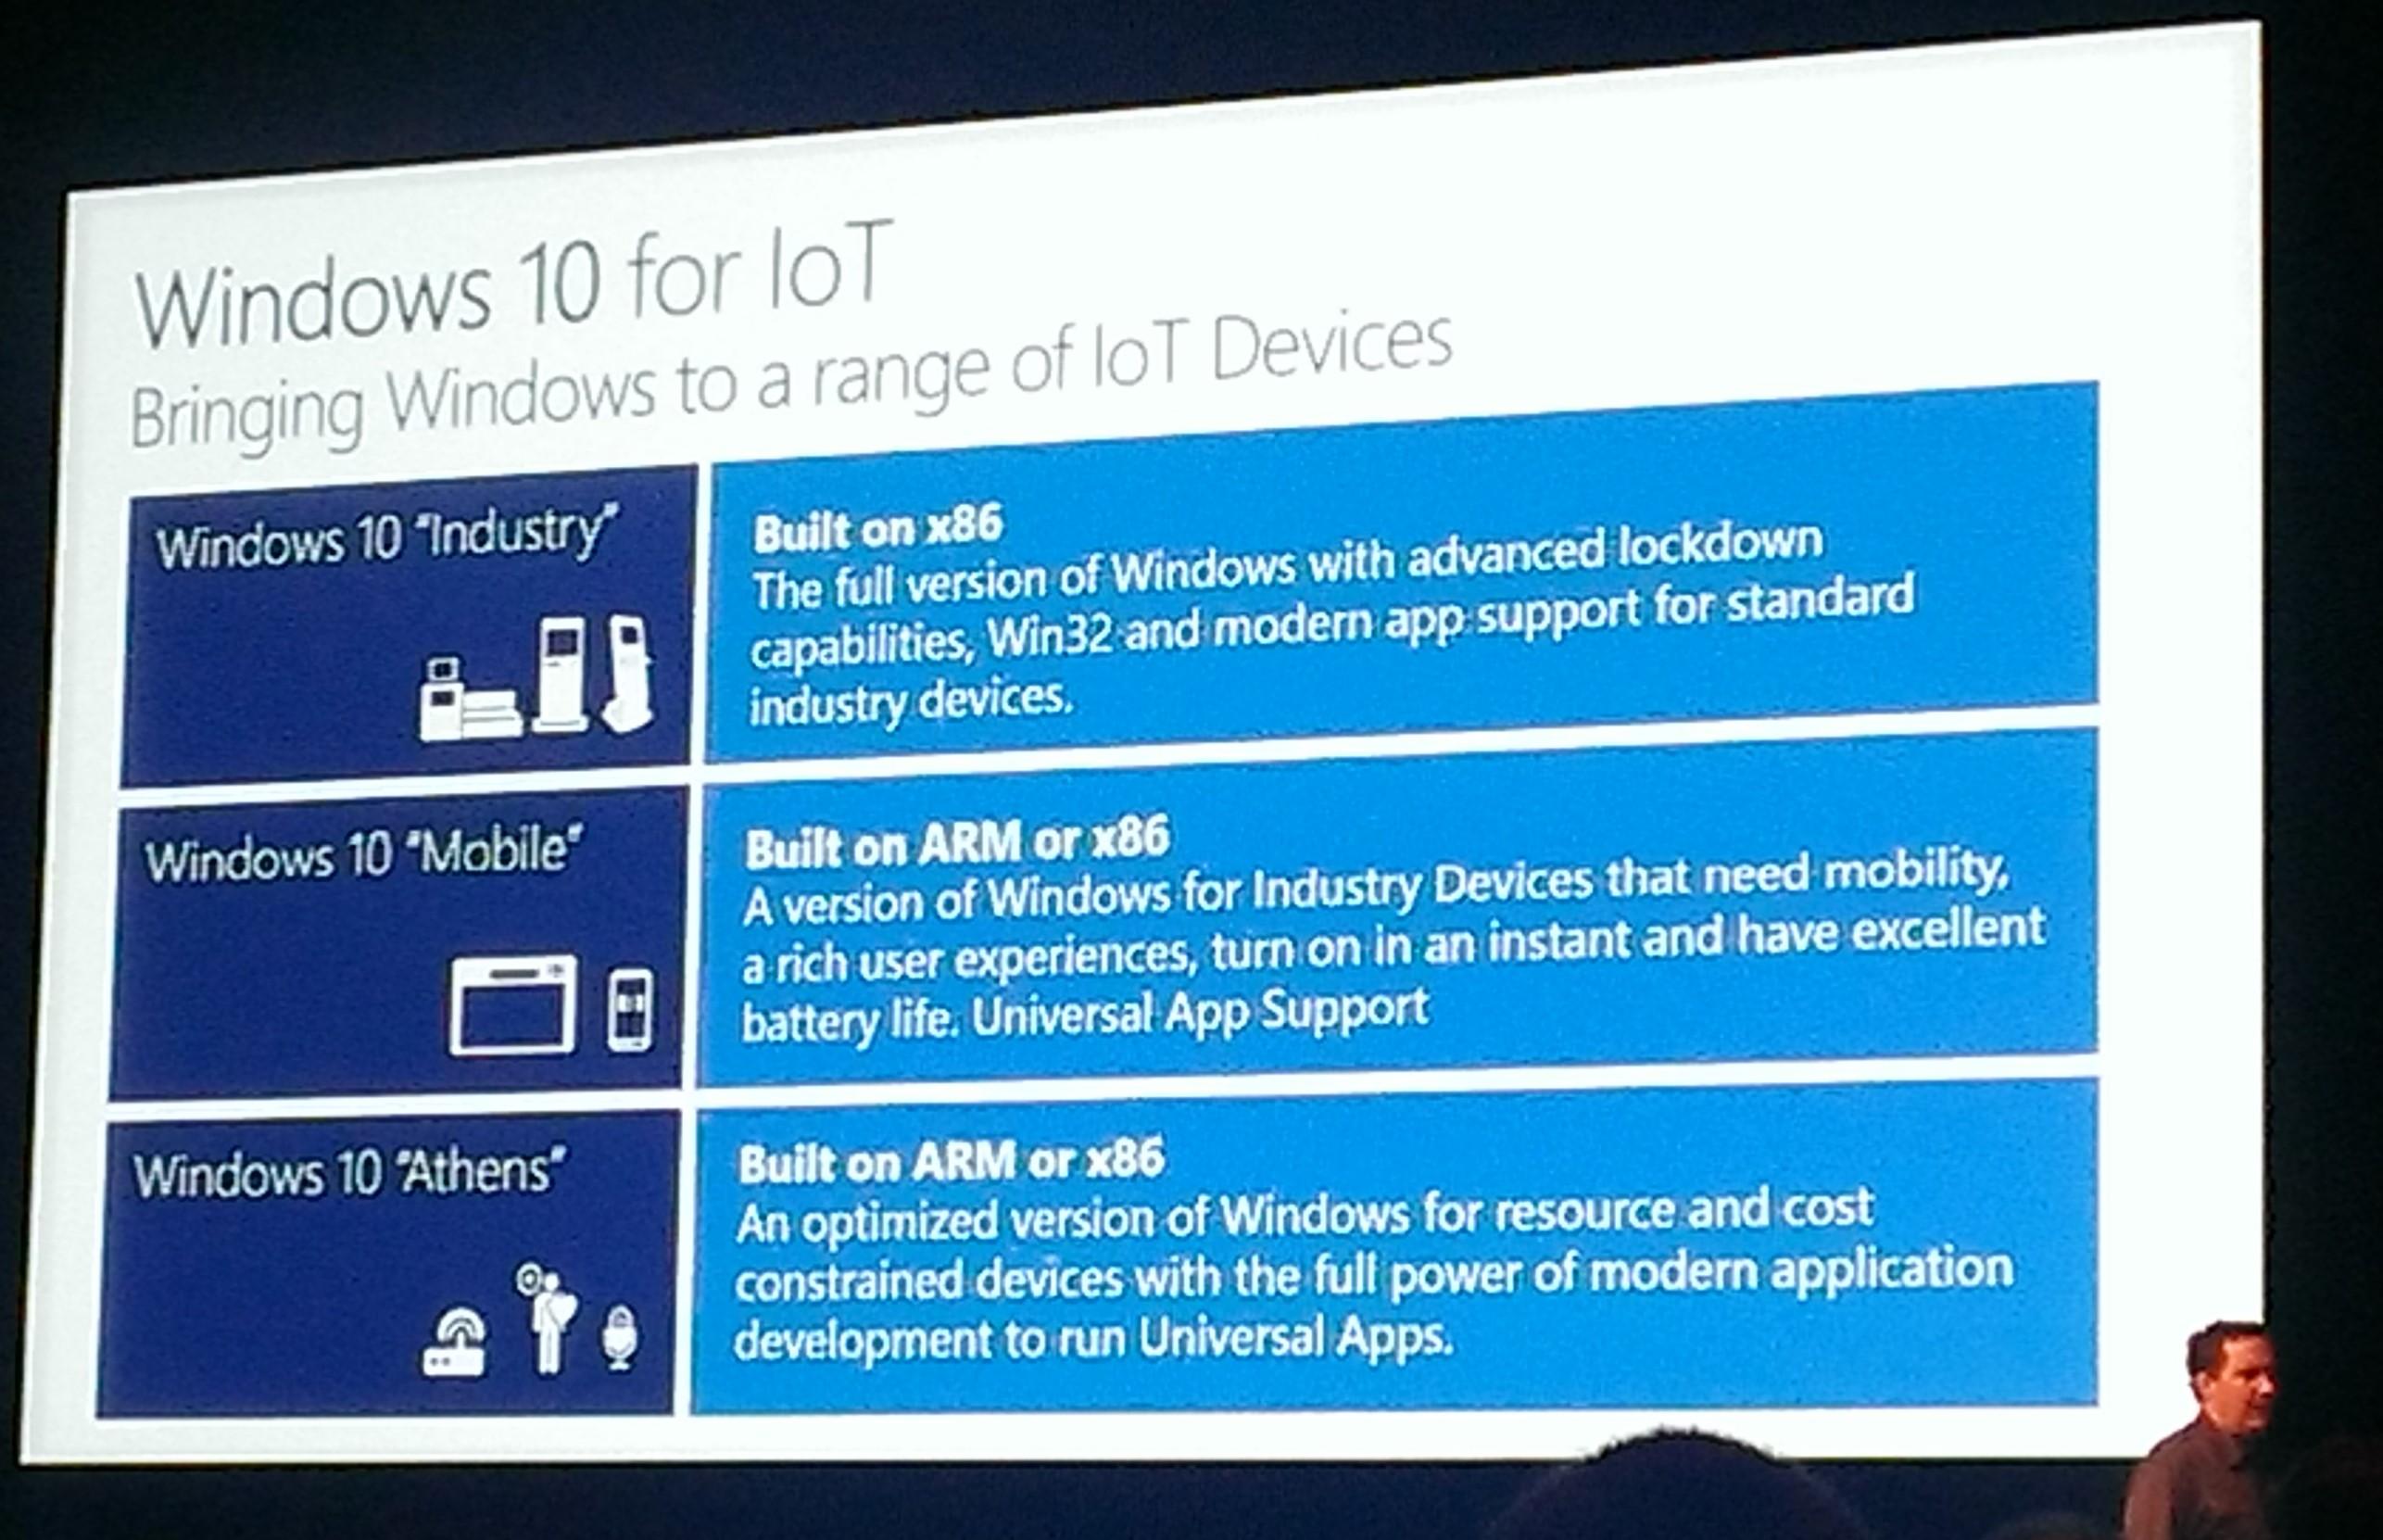 Windows 10 iot enterprise oem | Windows 10 Tablets for Business